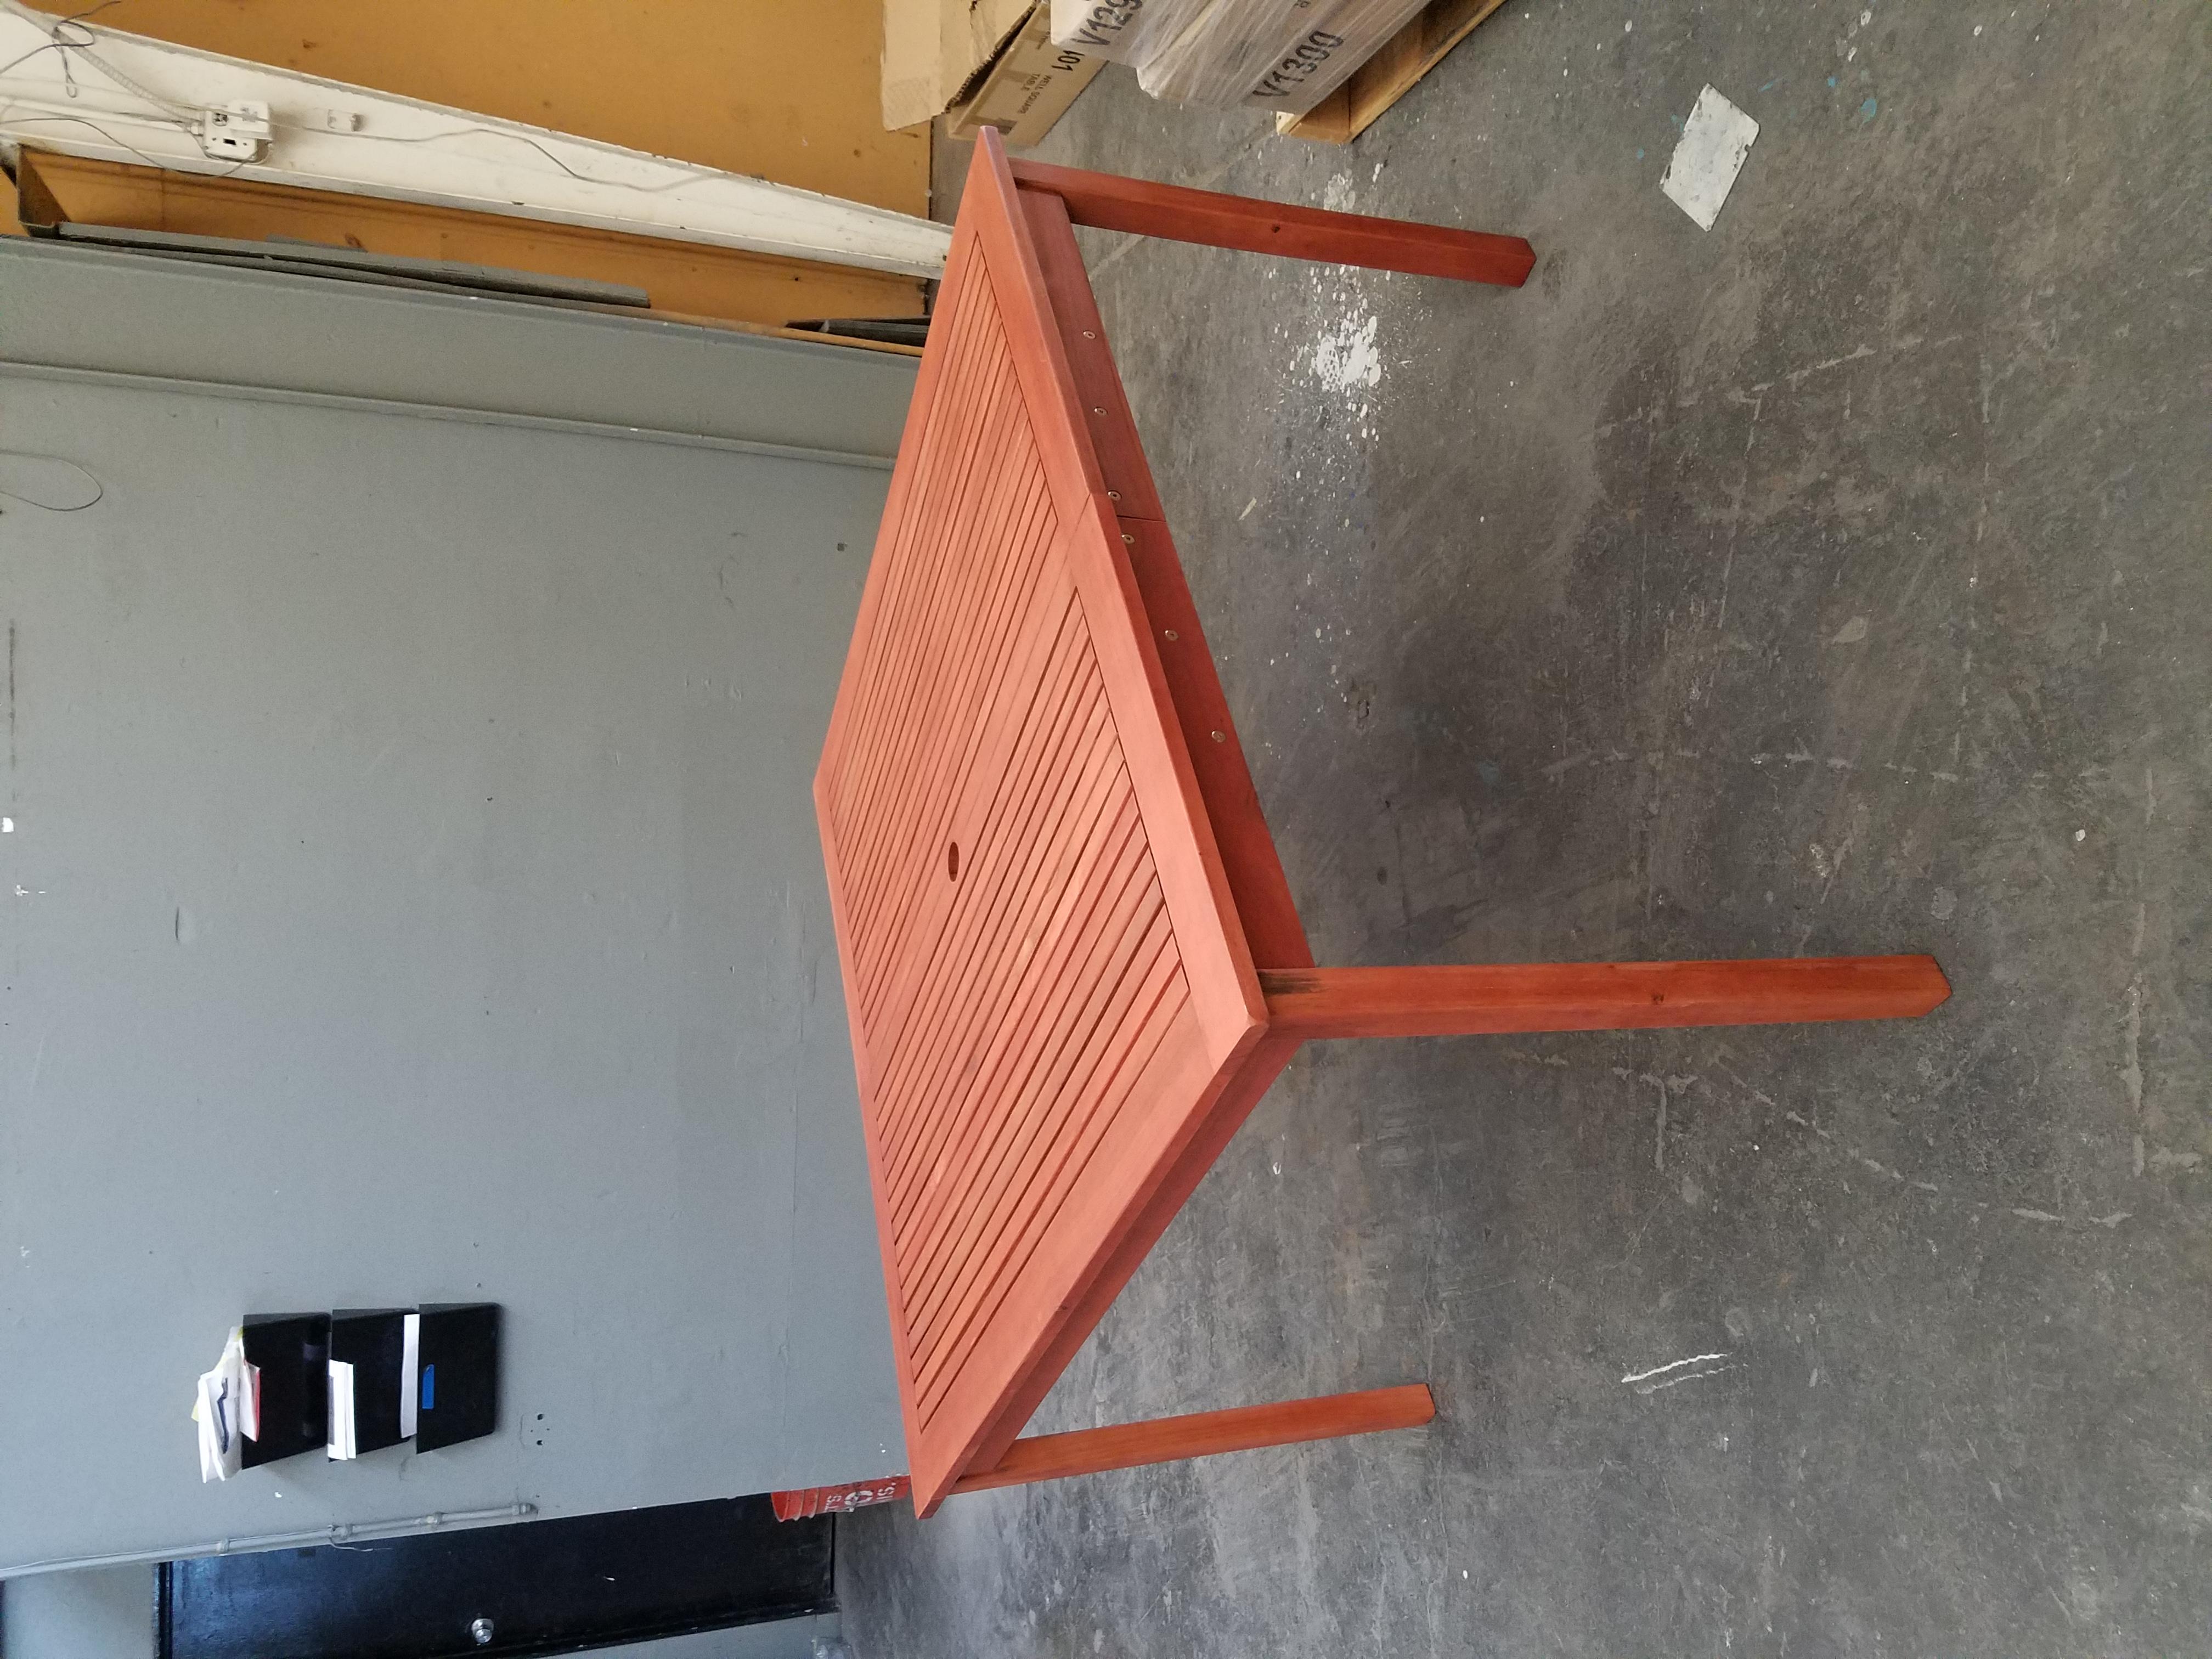 Eucalyptus table 47x47 $ 210.00